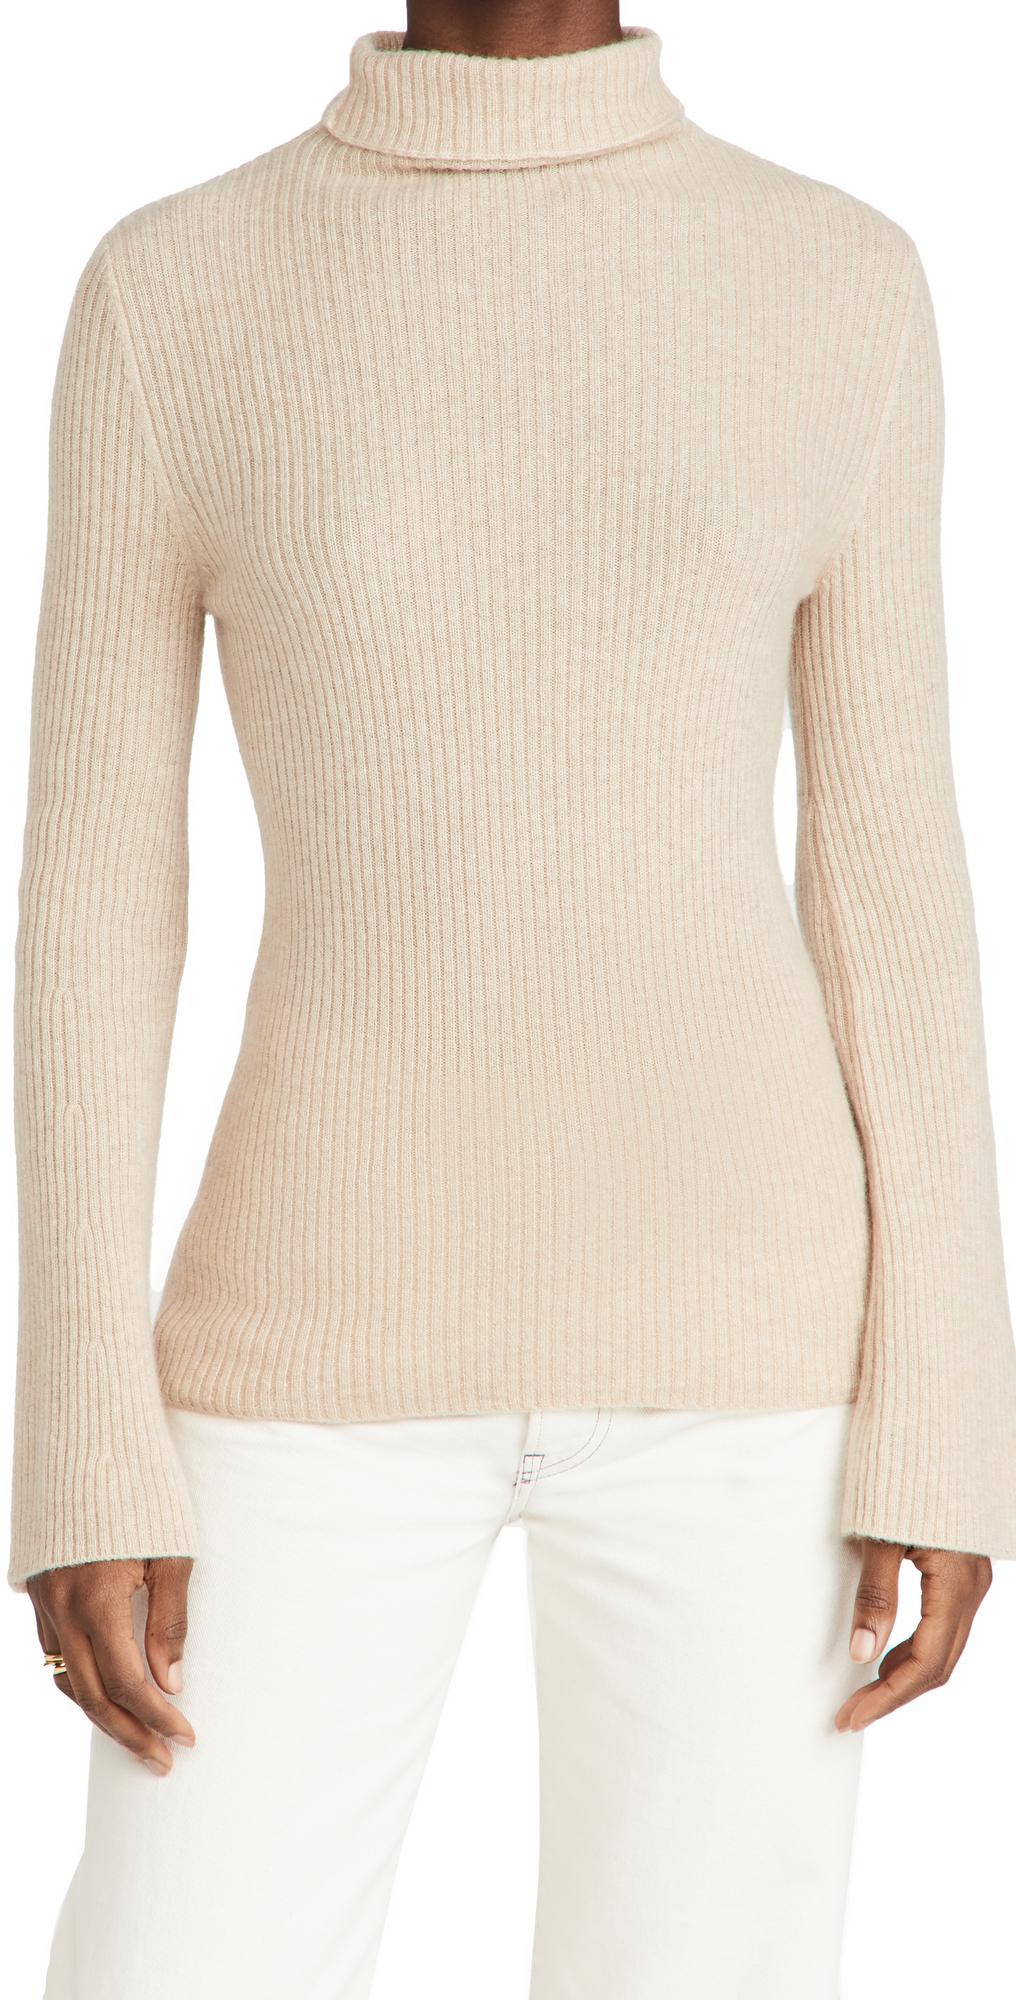 Bety Cashmere Sweater